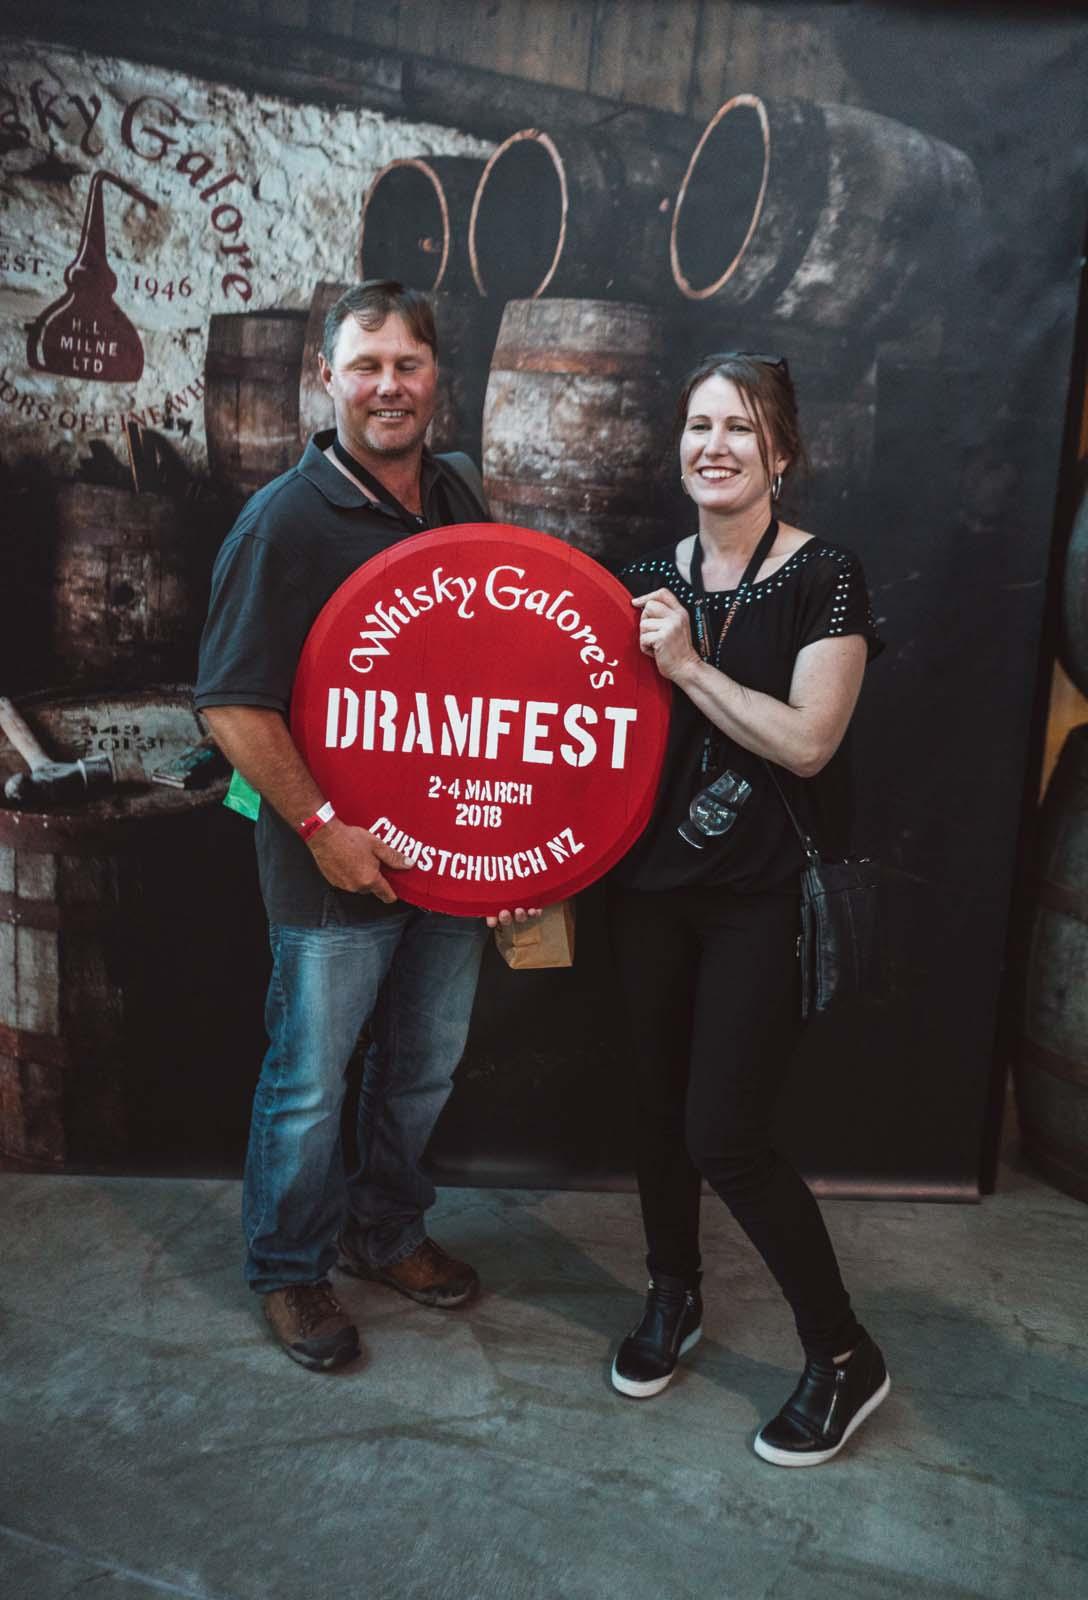 Dramfest 2018 for Whisky Galore-156.jpg